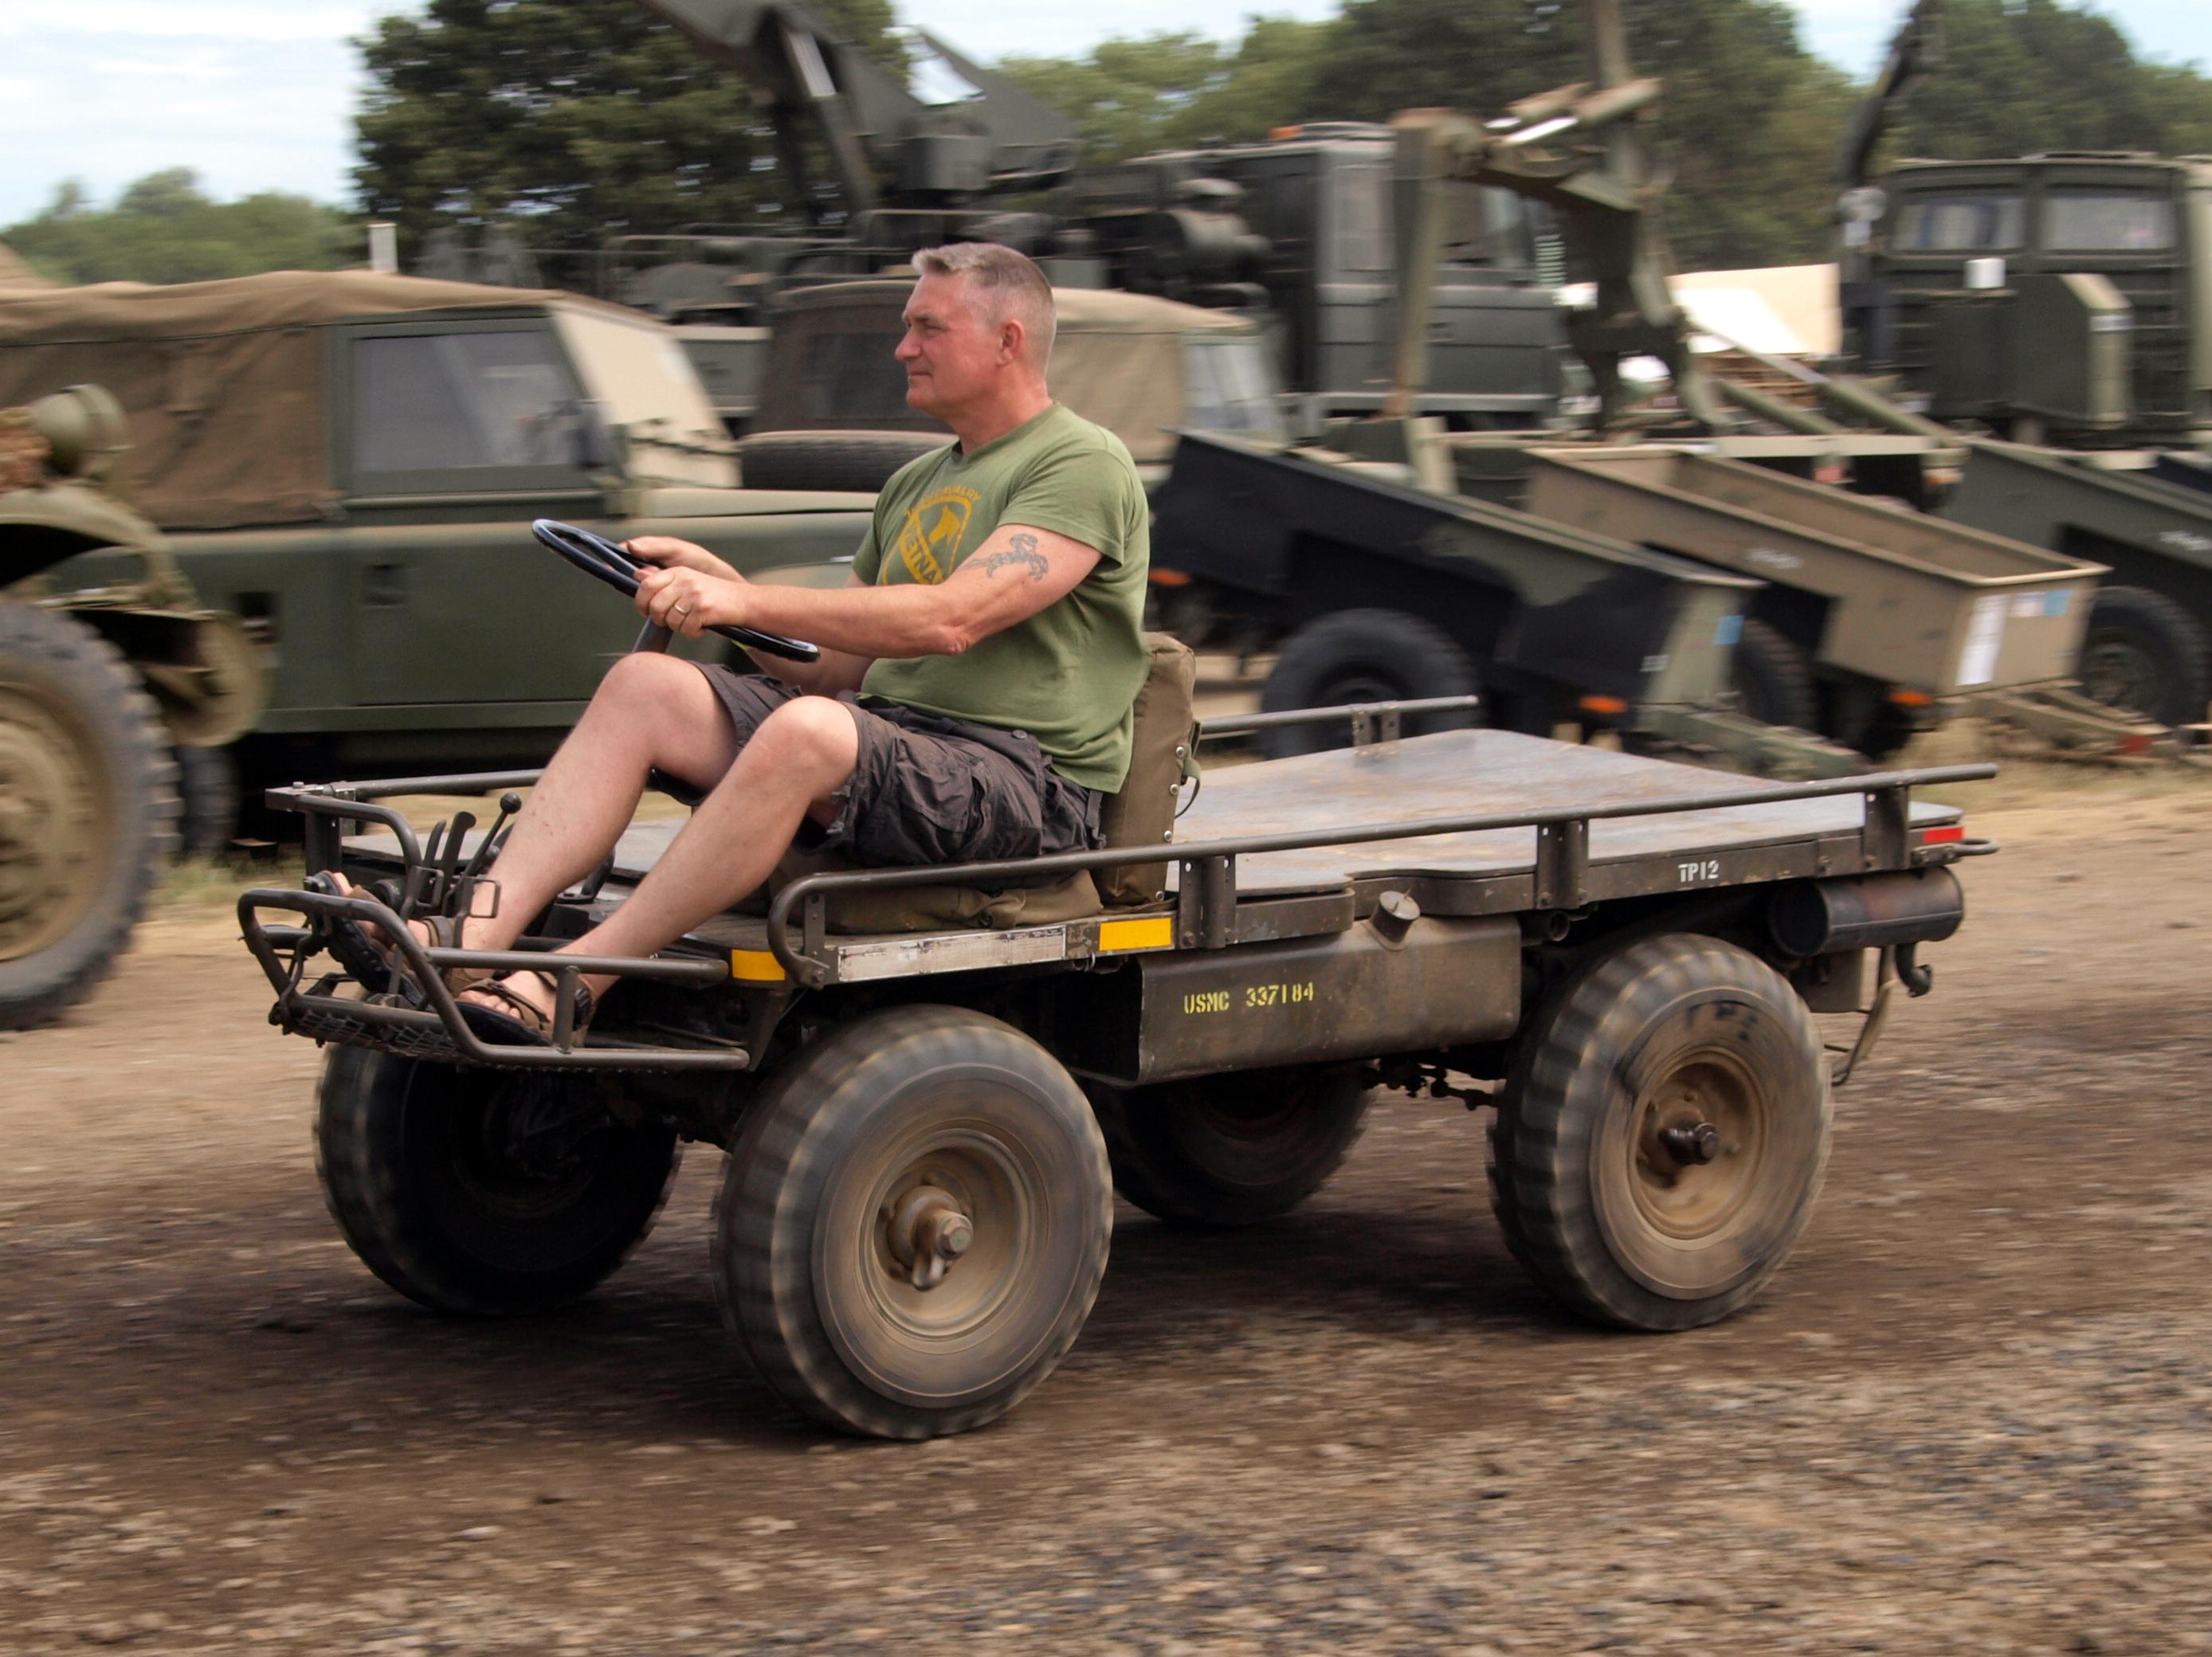 G I Usmc  S Combat Desert Jacket In Civilian Clothes